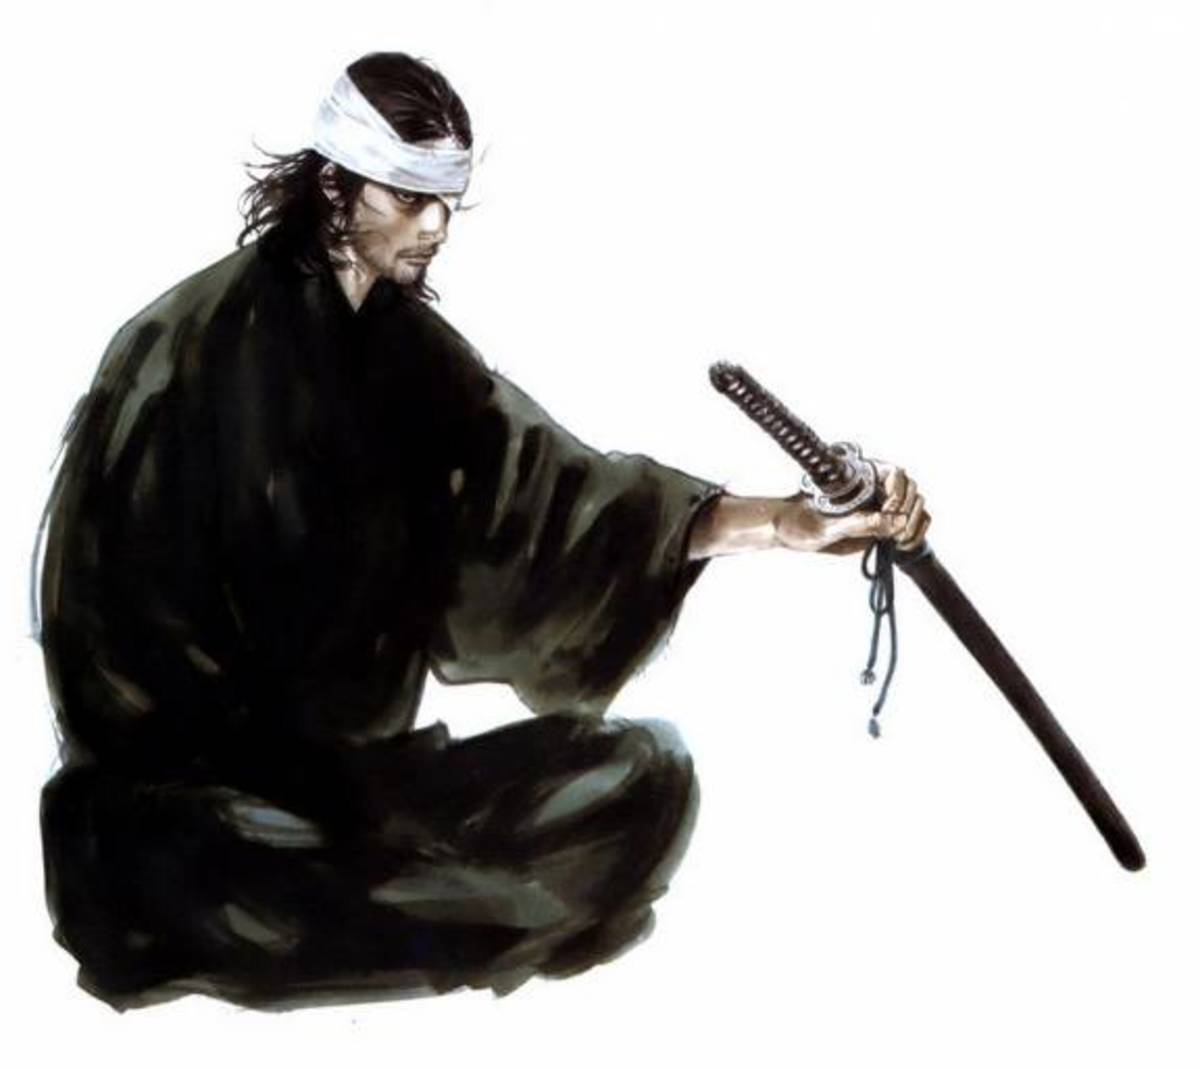 Japanese swordsman